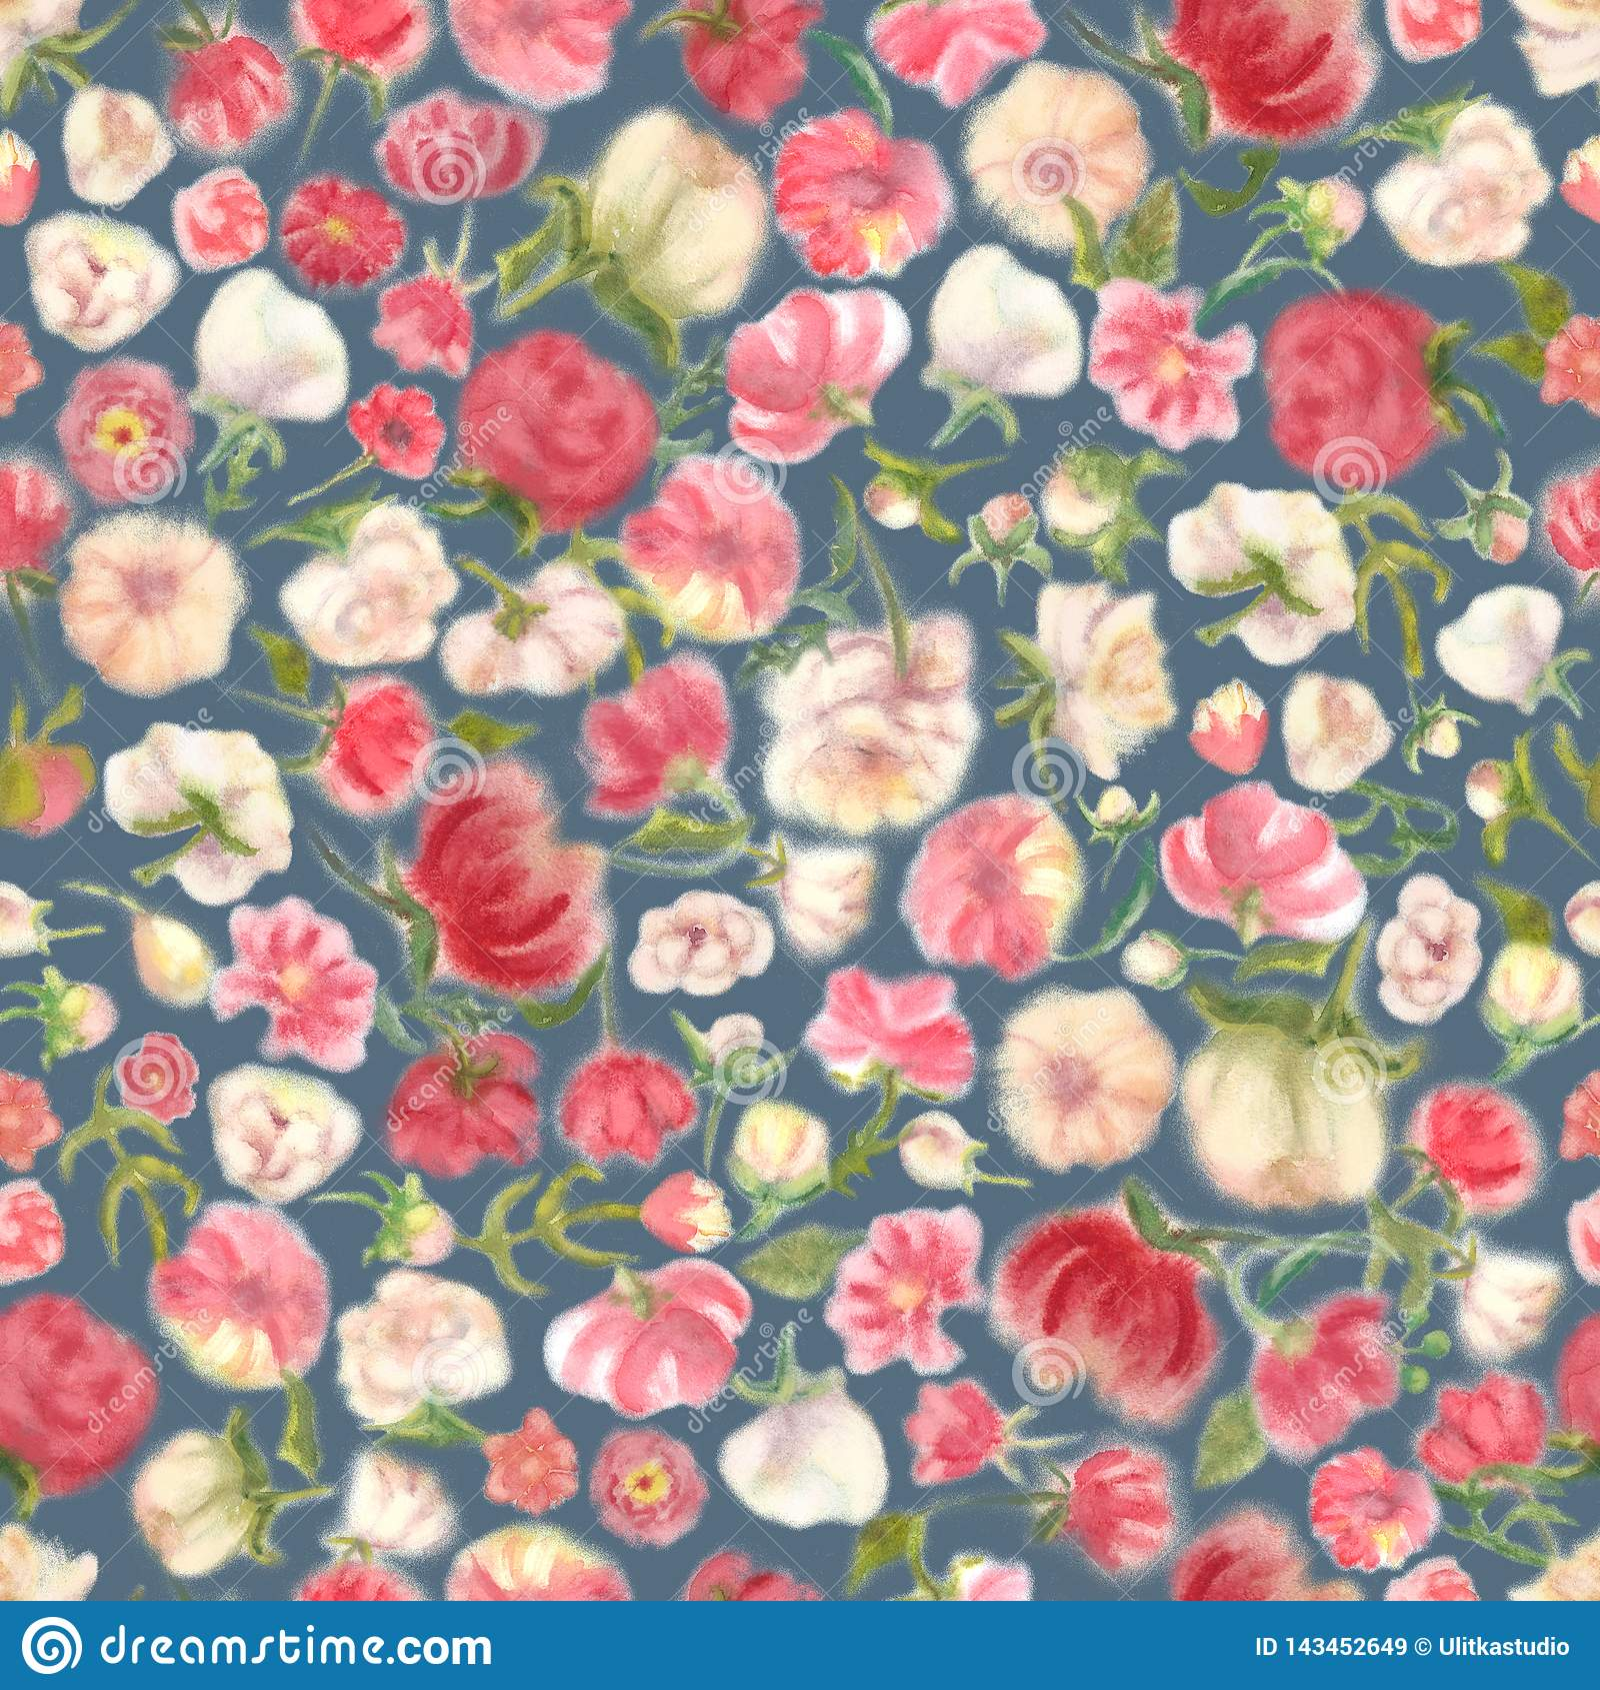 Aquarelle Flower Seamless Wallpaper Blur Floral Stock